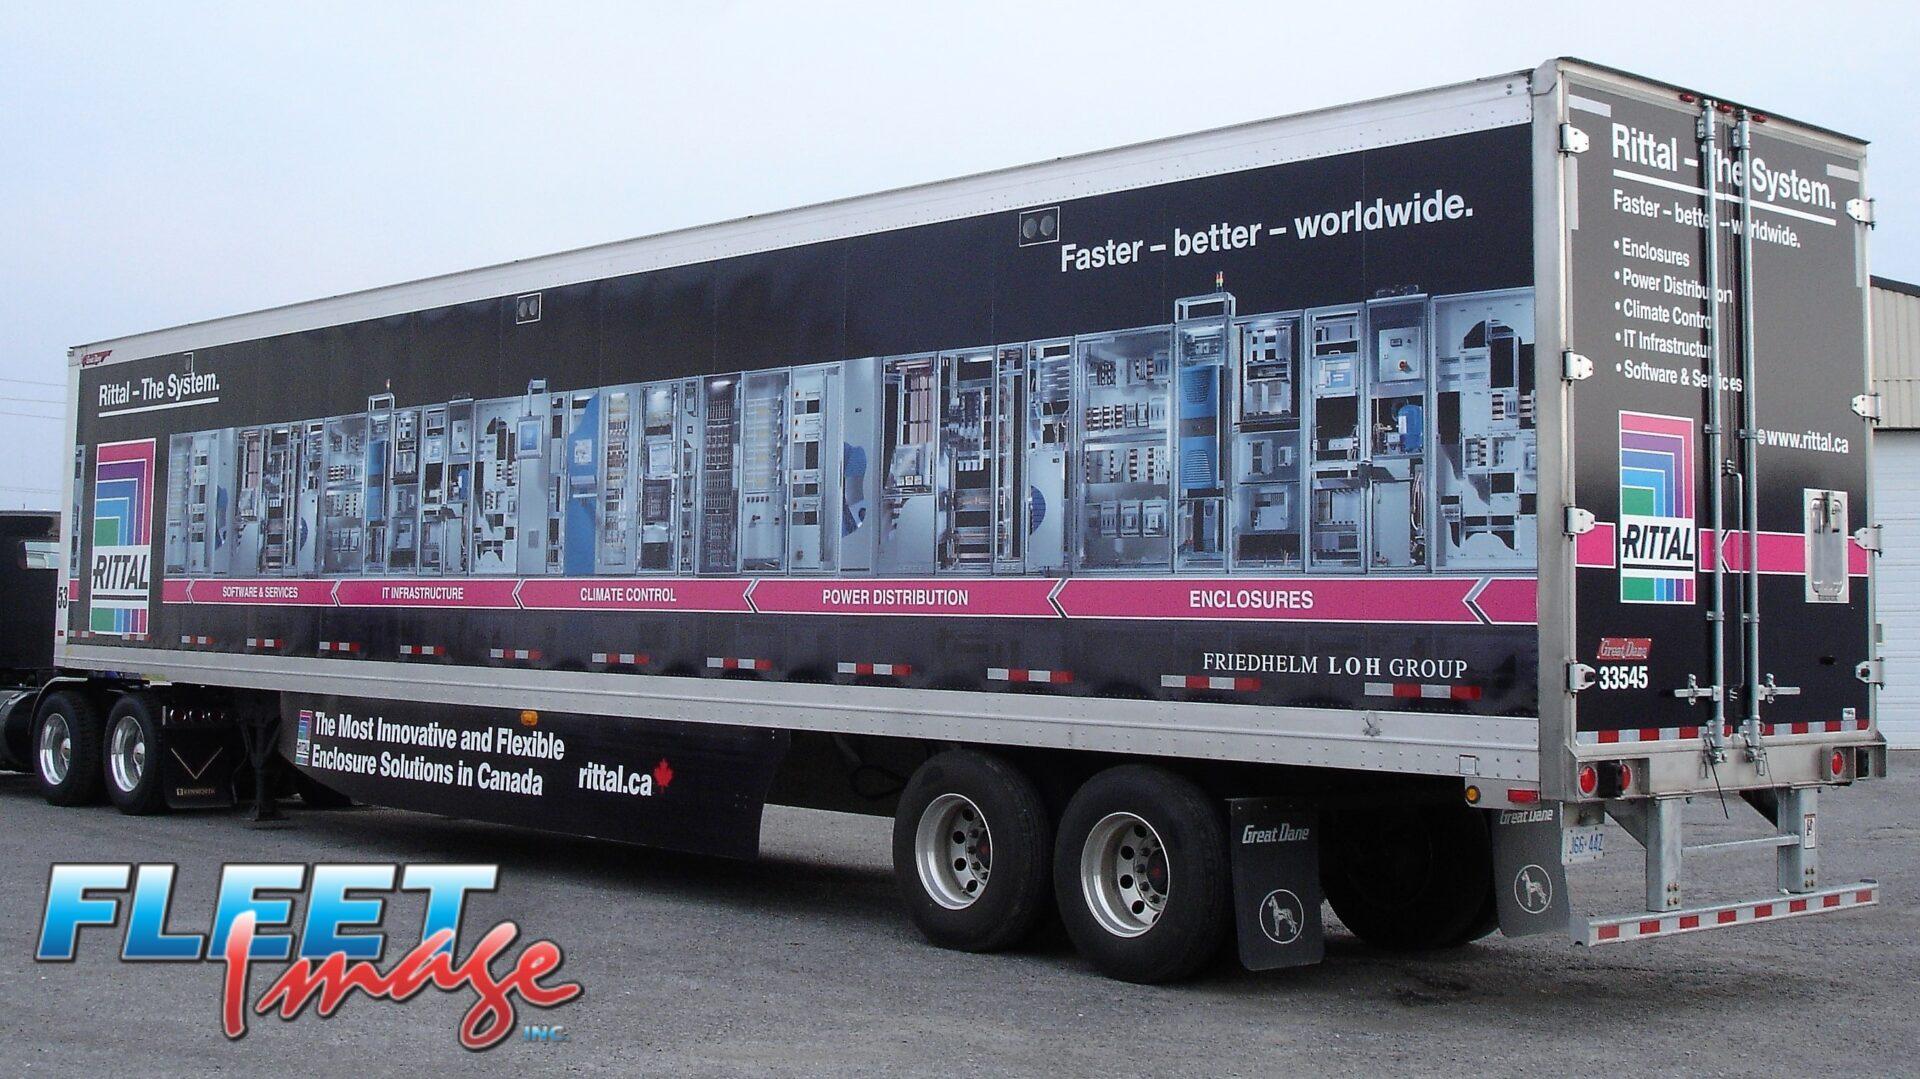 Rittal decal sticker on a truck